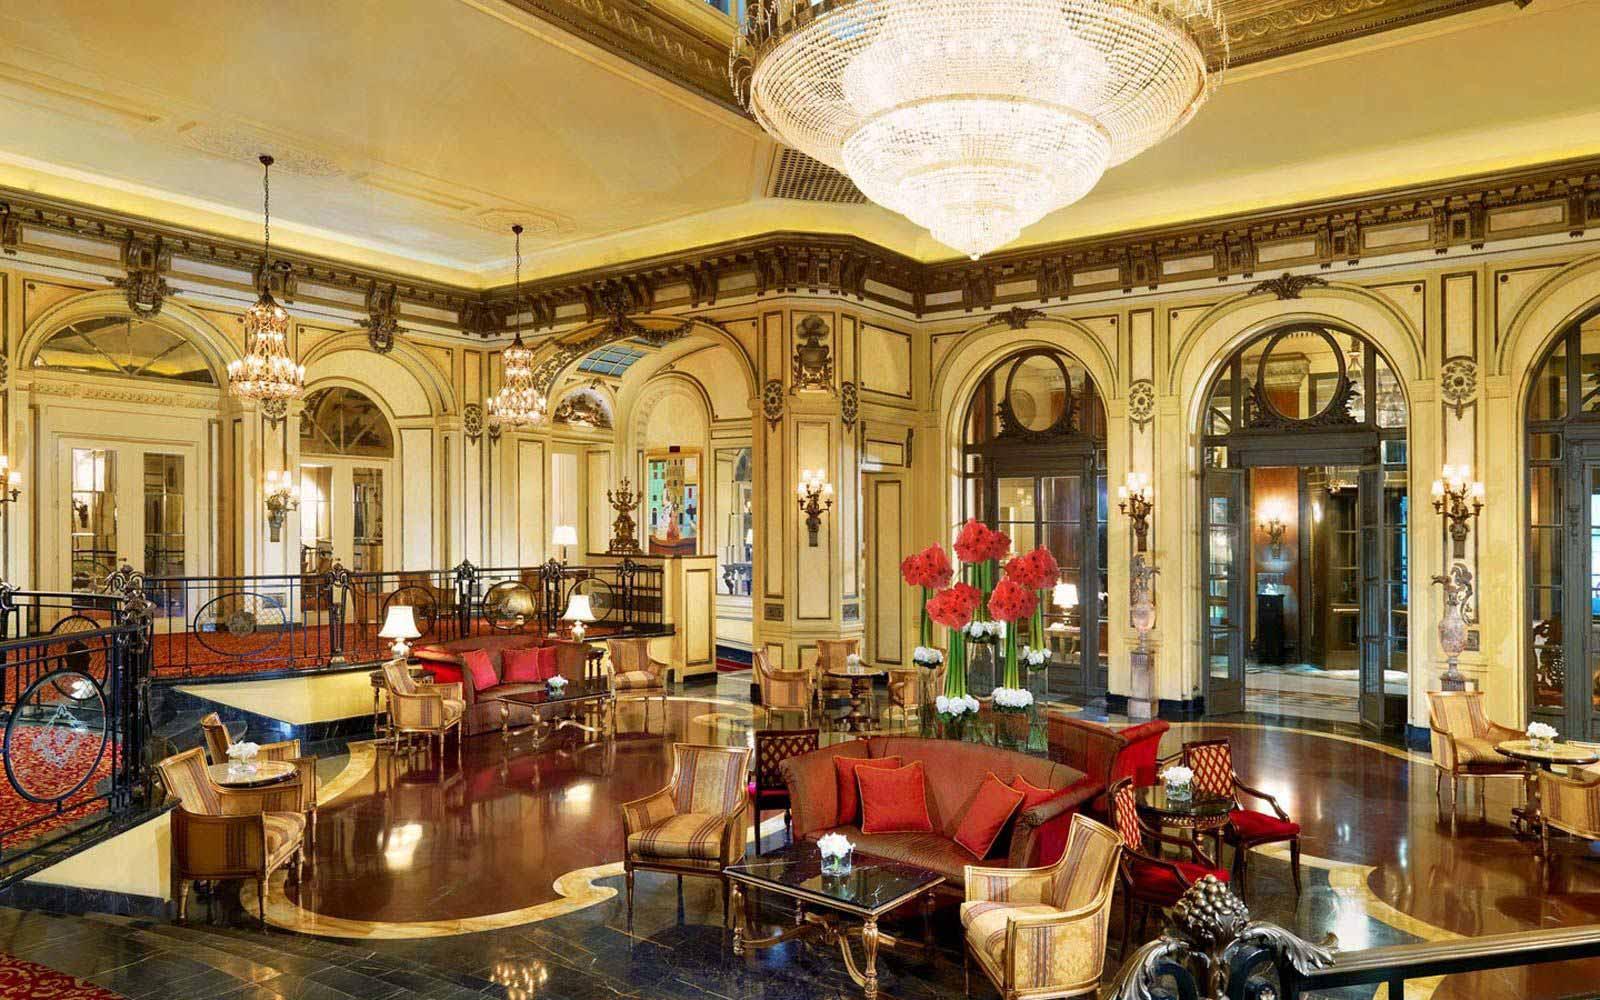 Grand Lobby at St.Regis Grand Hotel